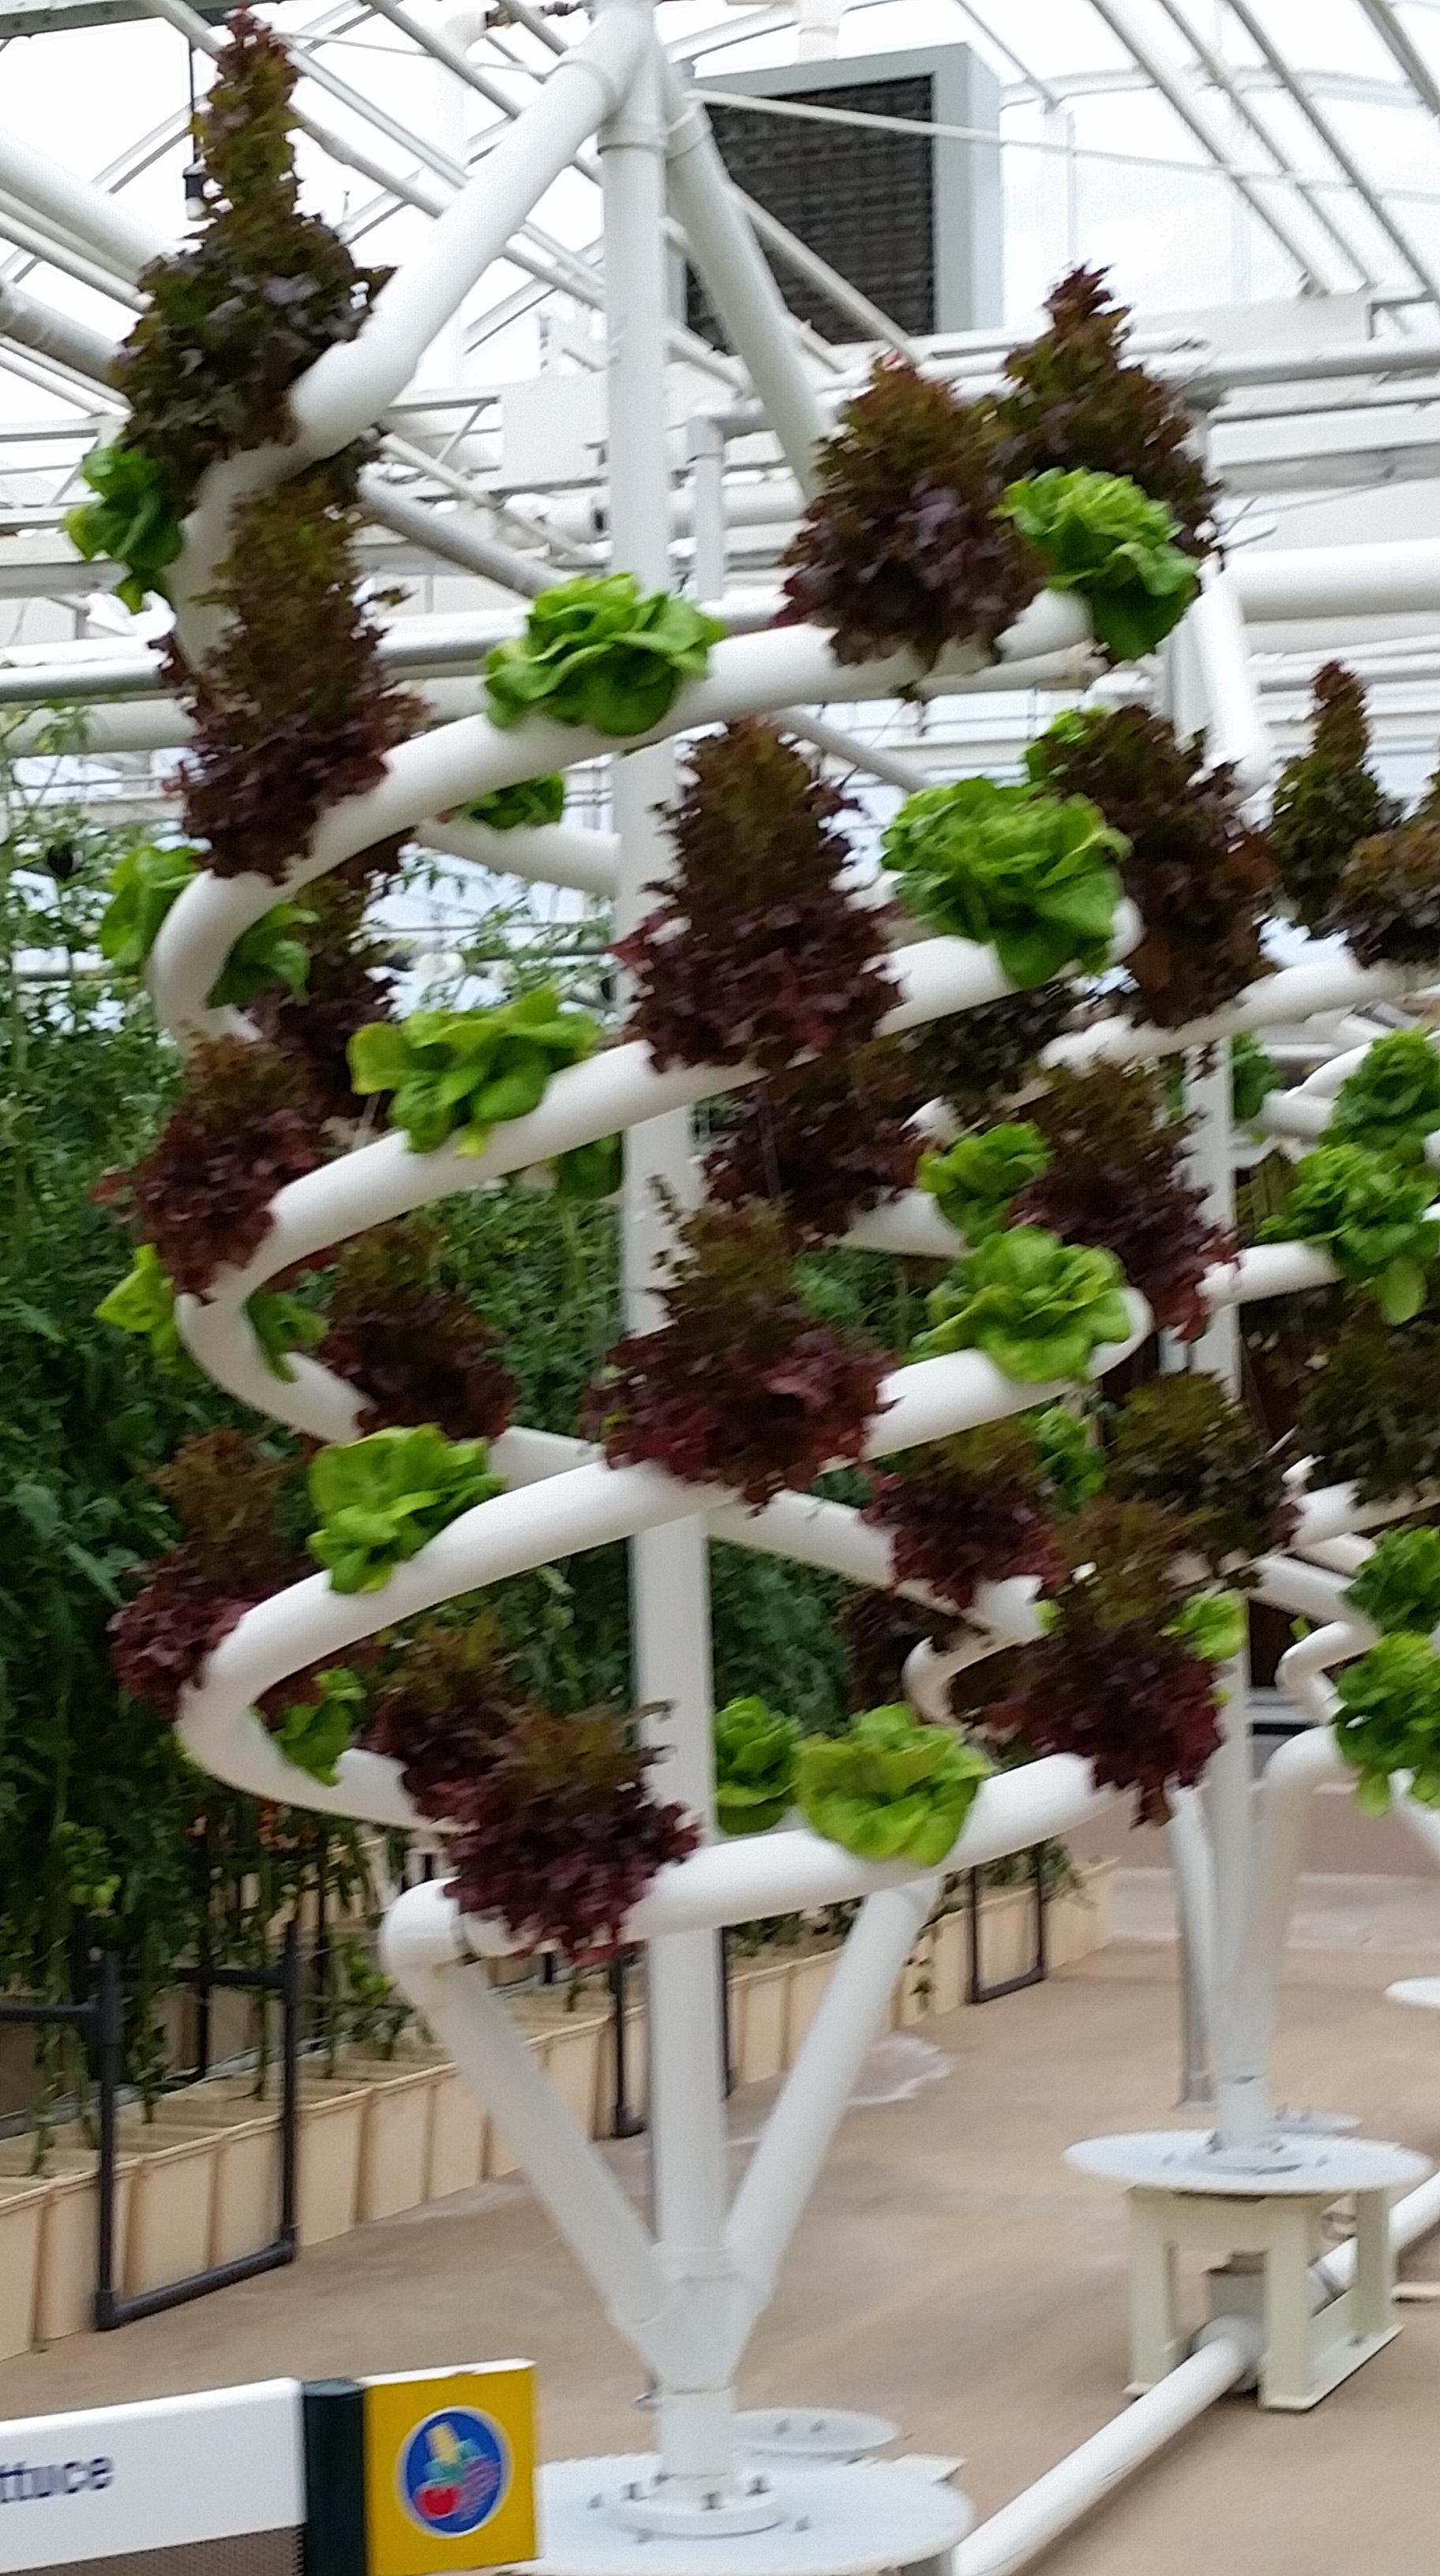 Walt Disney World Epcot exhibit Living with the Land - lettuce shown.